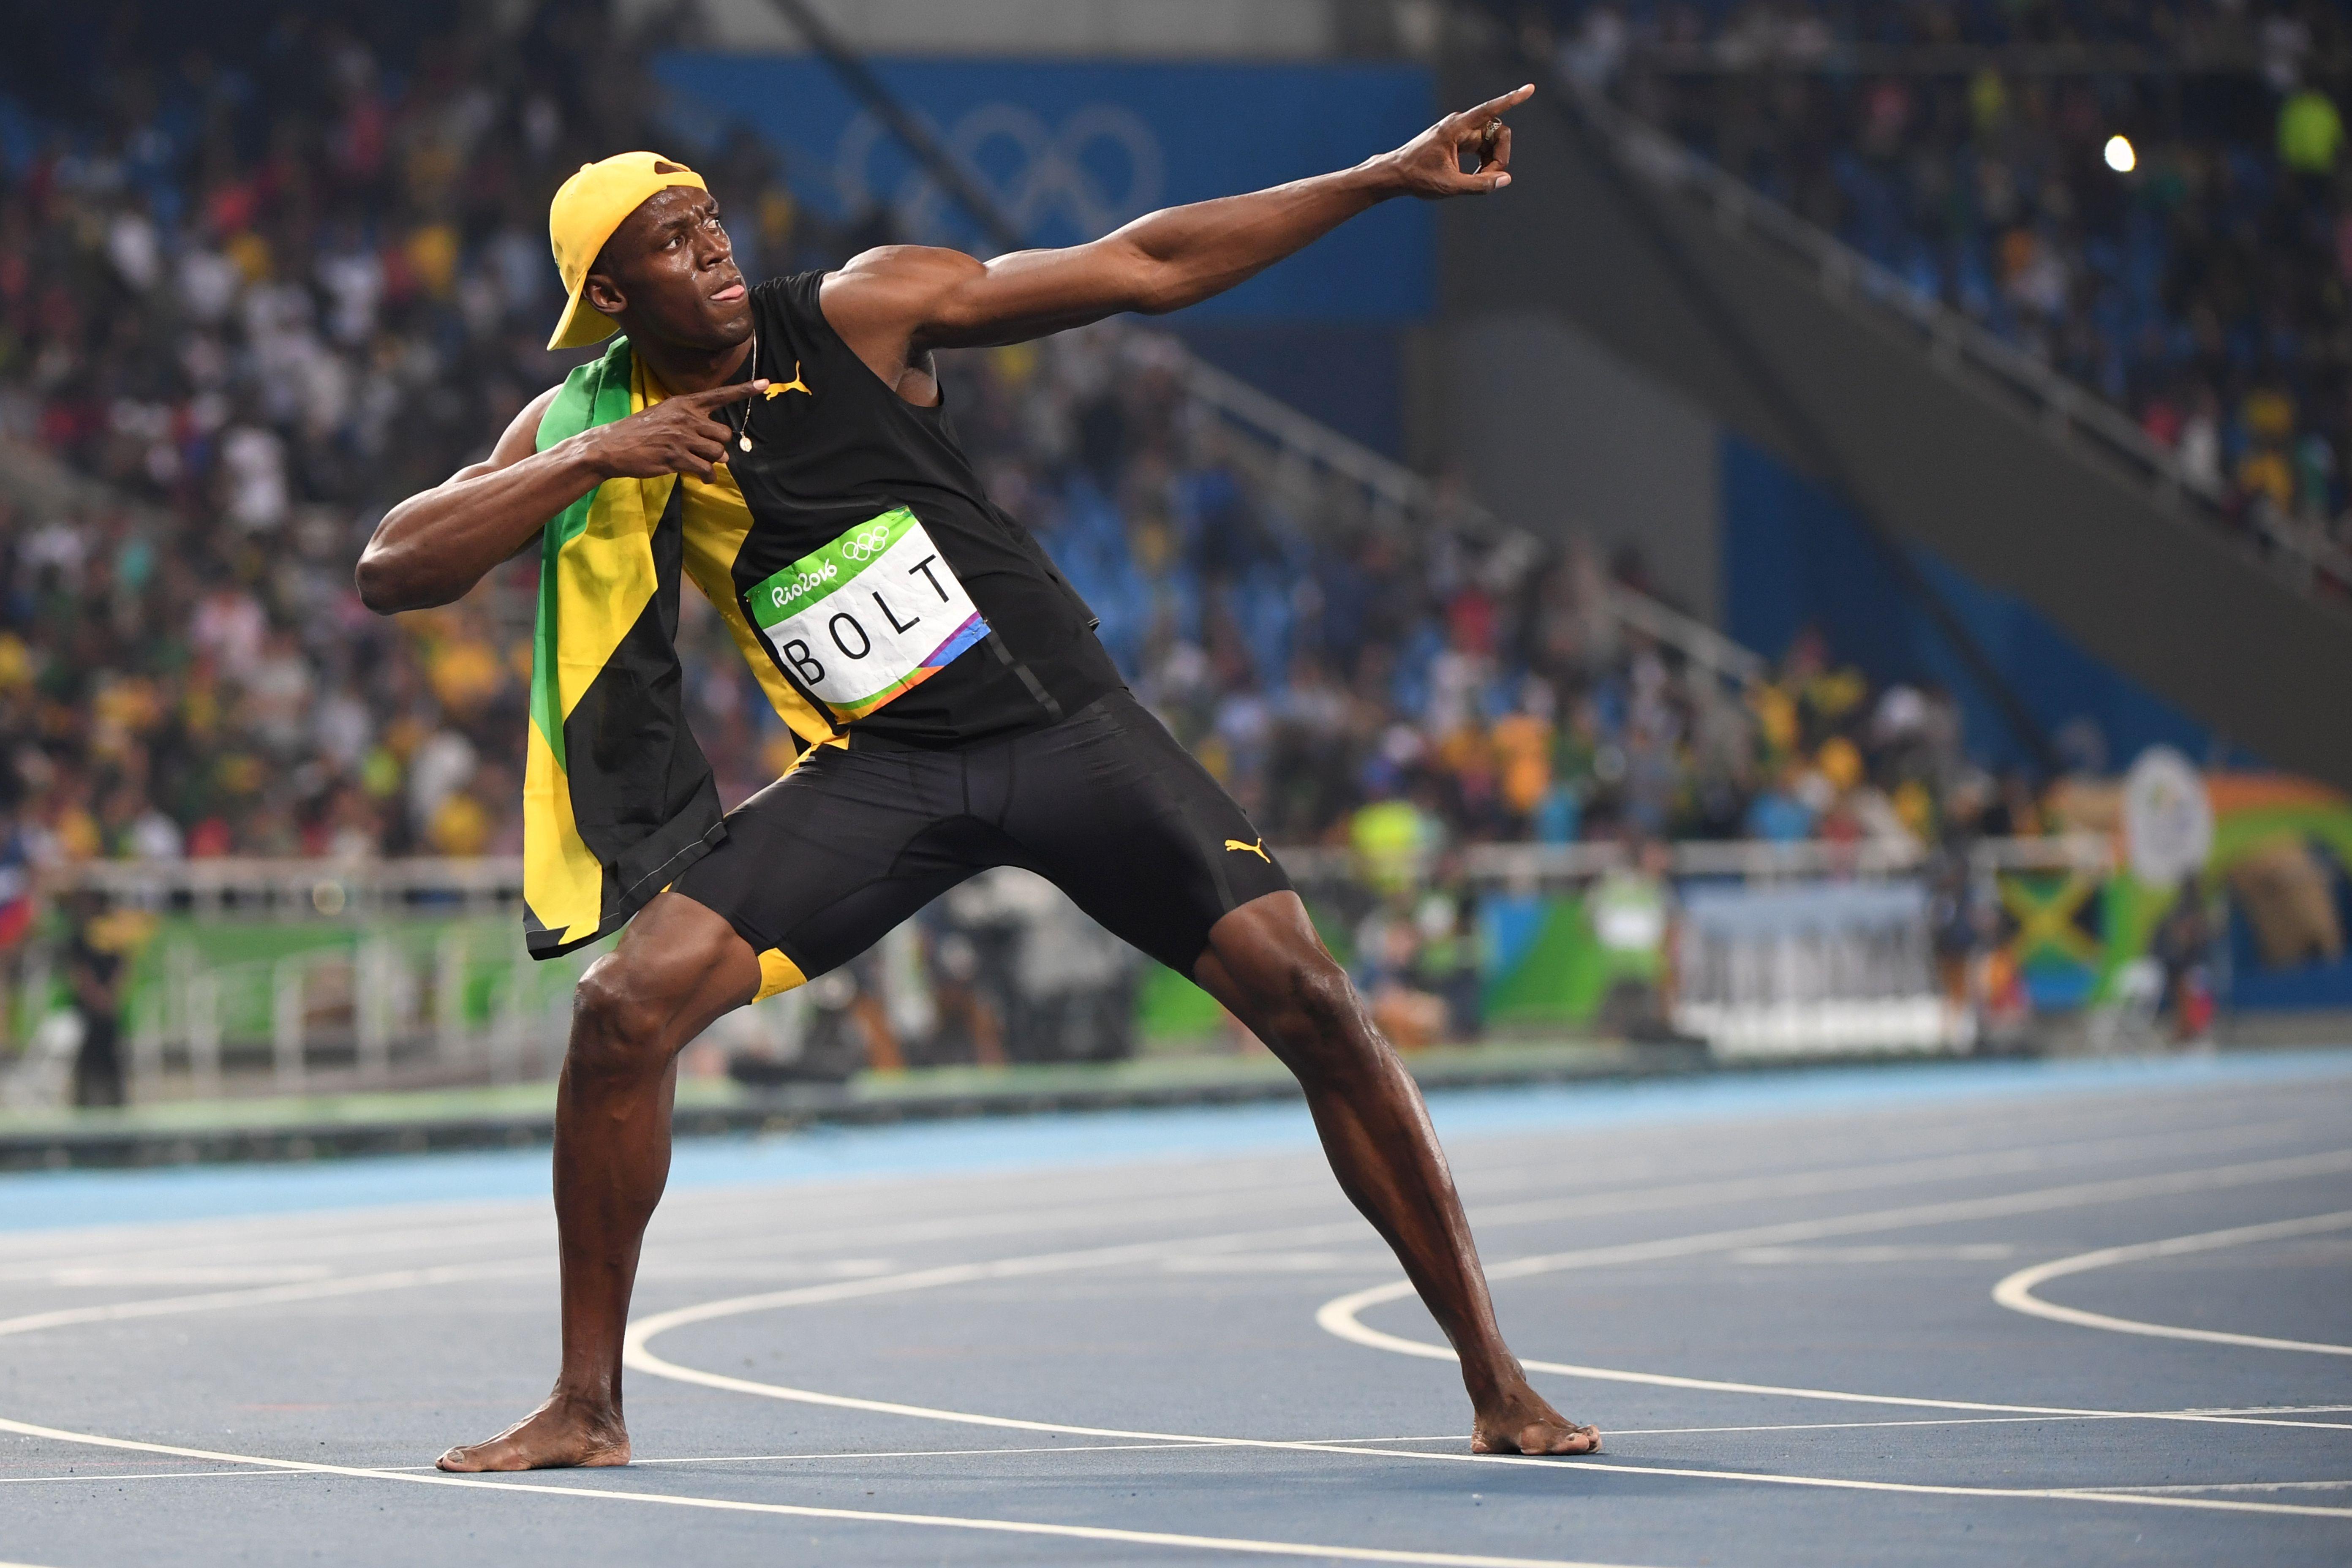 Feet In Meter The Amazing Feet Of Usain Bolt Cbs News